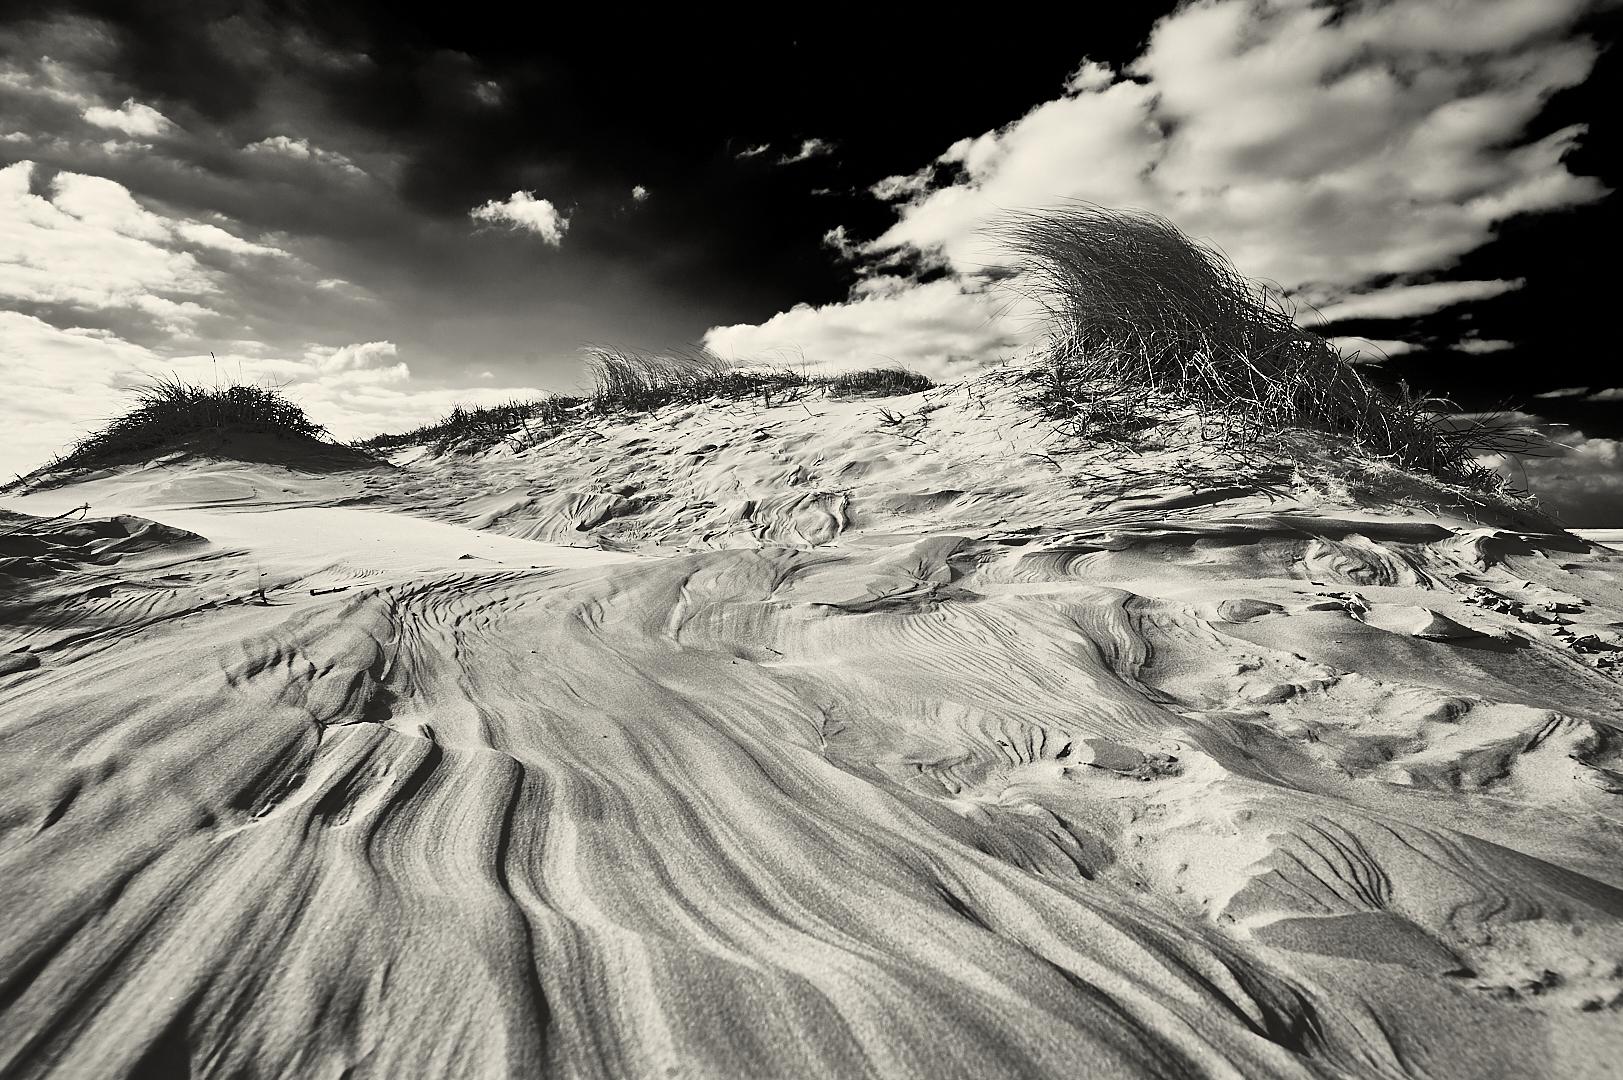 Borkum dunes, Germany